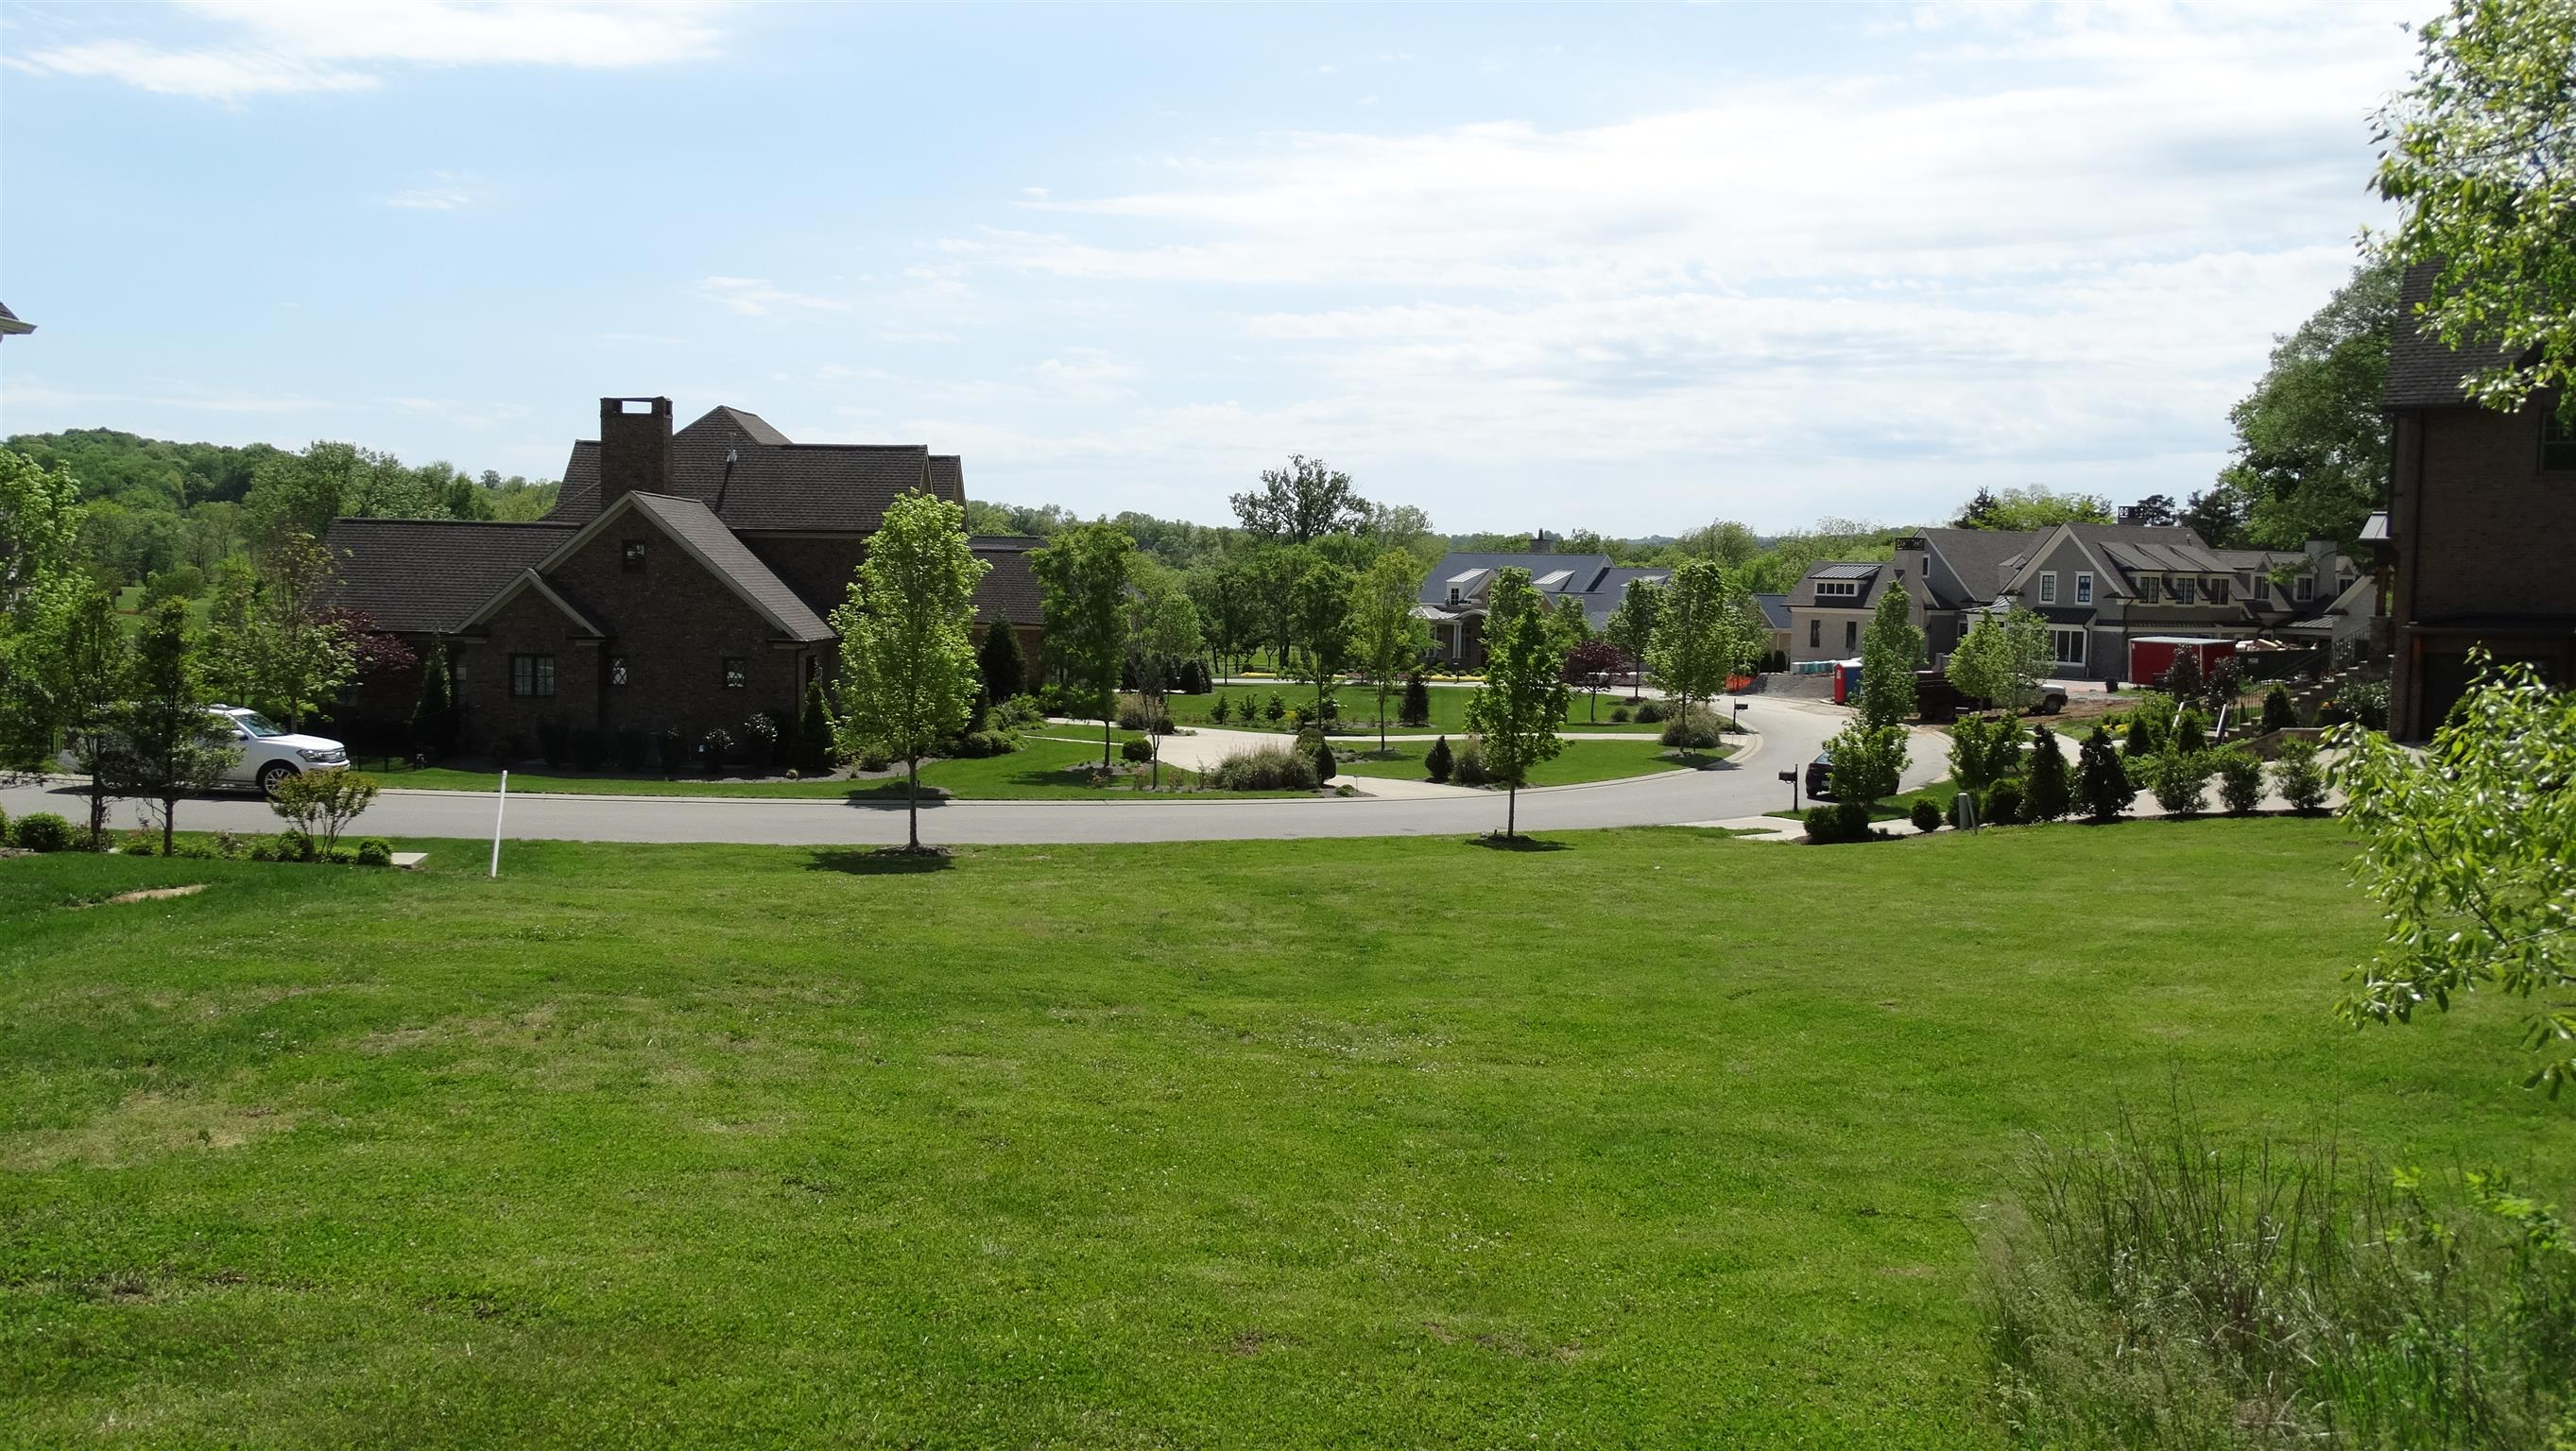 8831 Drosera Cir (Lot 6088), College Grove, TN 37046 - College Grove, TN real estate listing